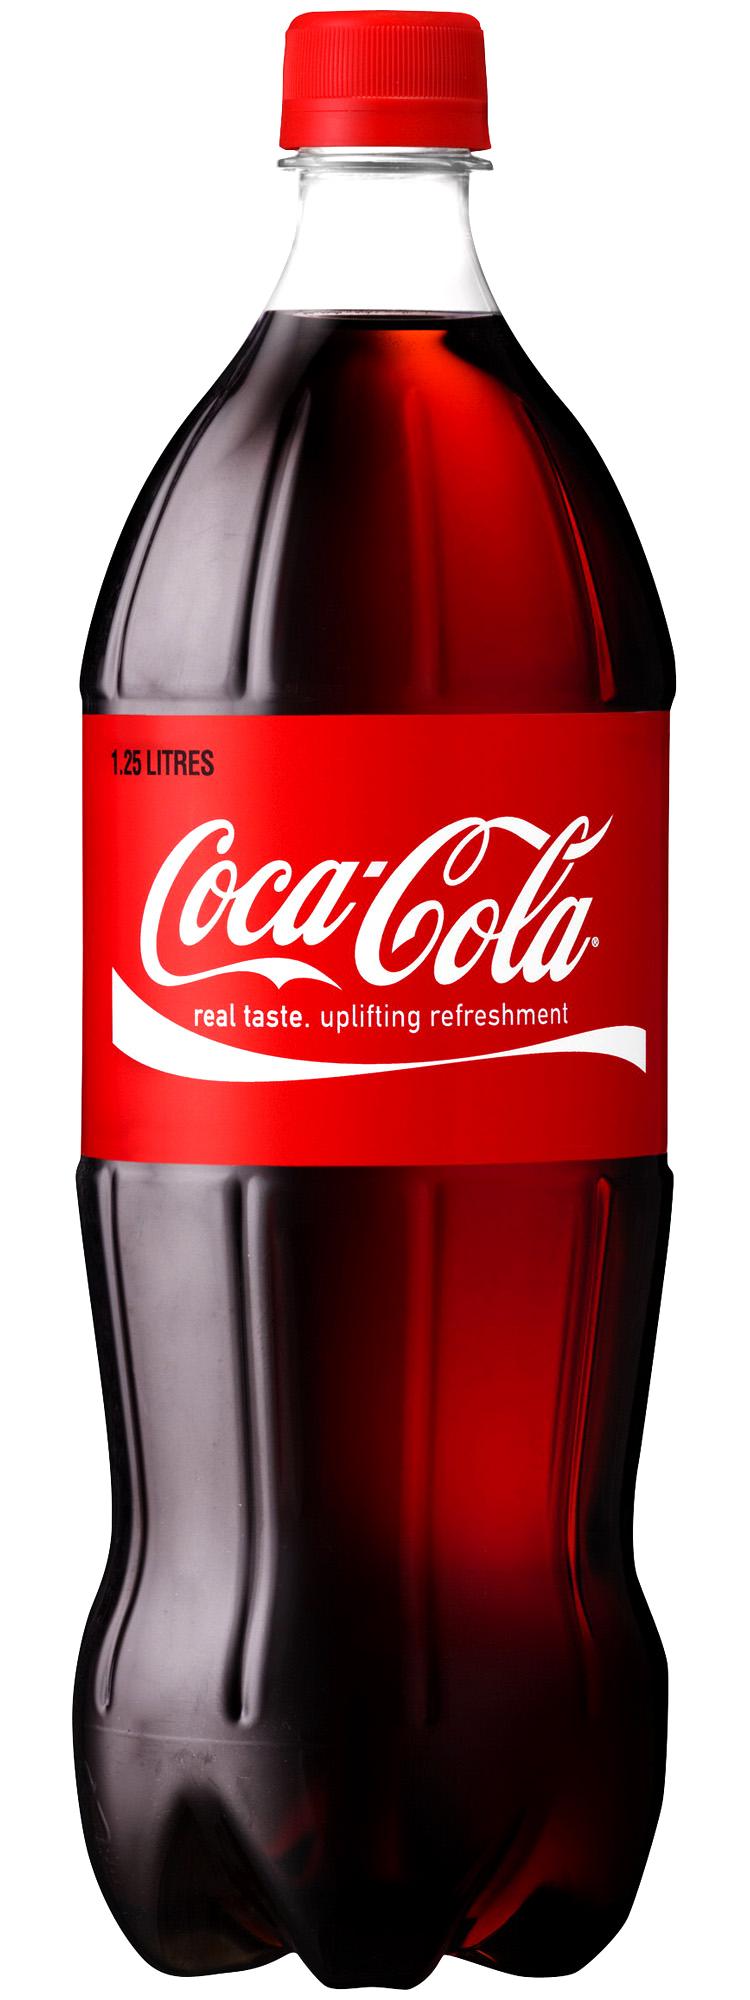 Coca cola image download. Diet coke bottle png